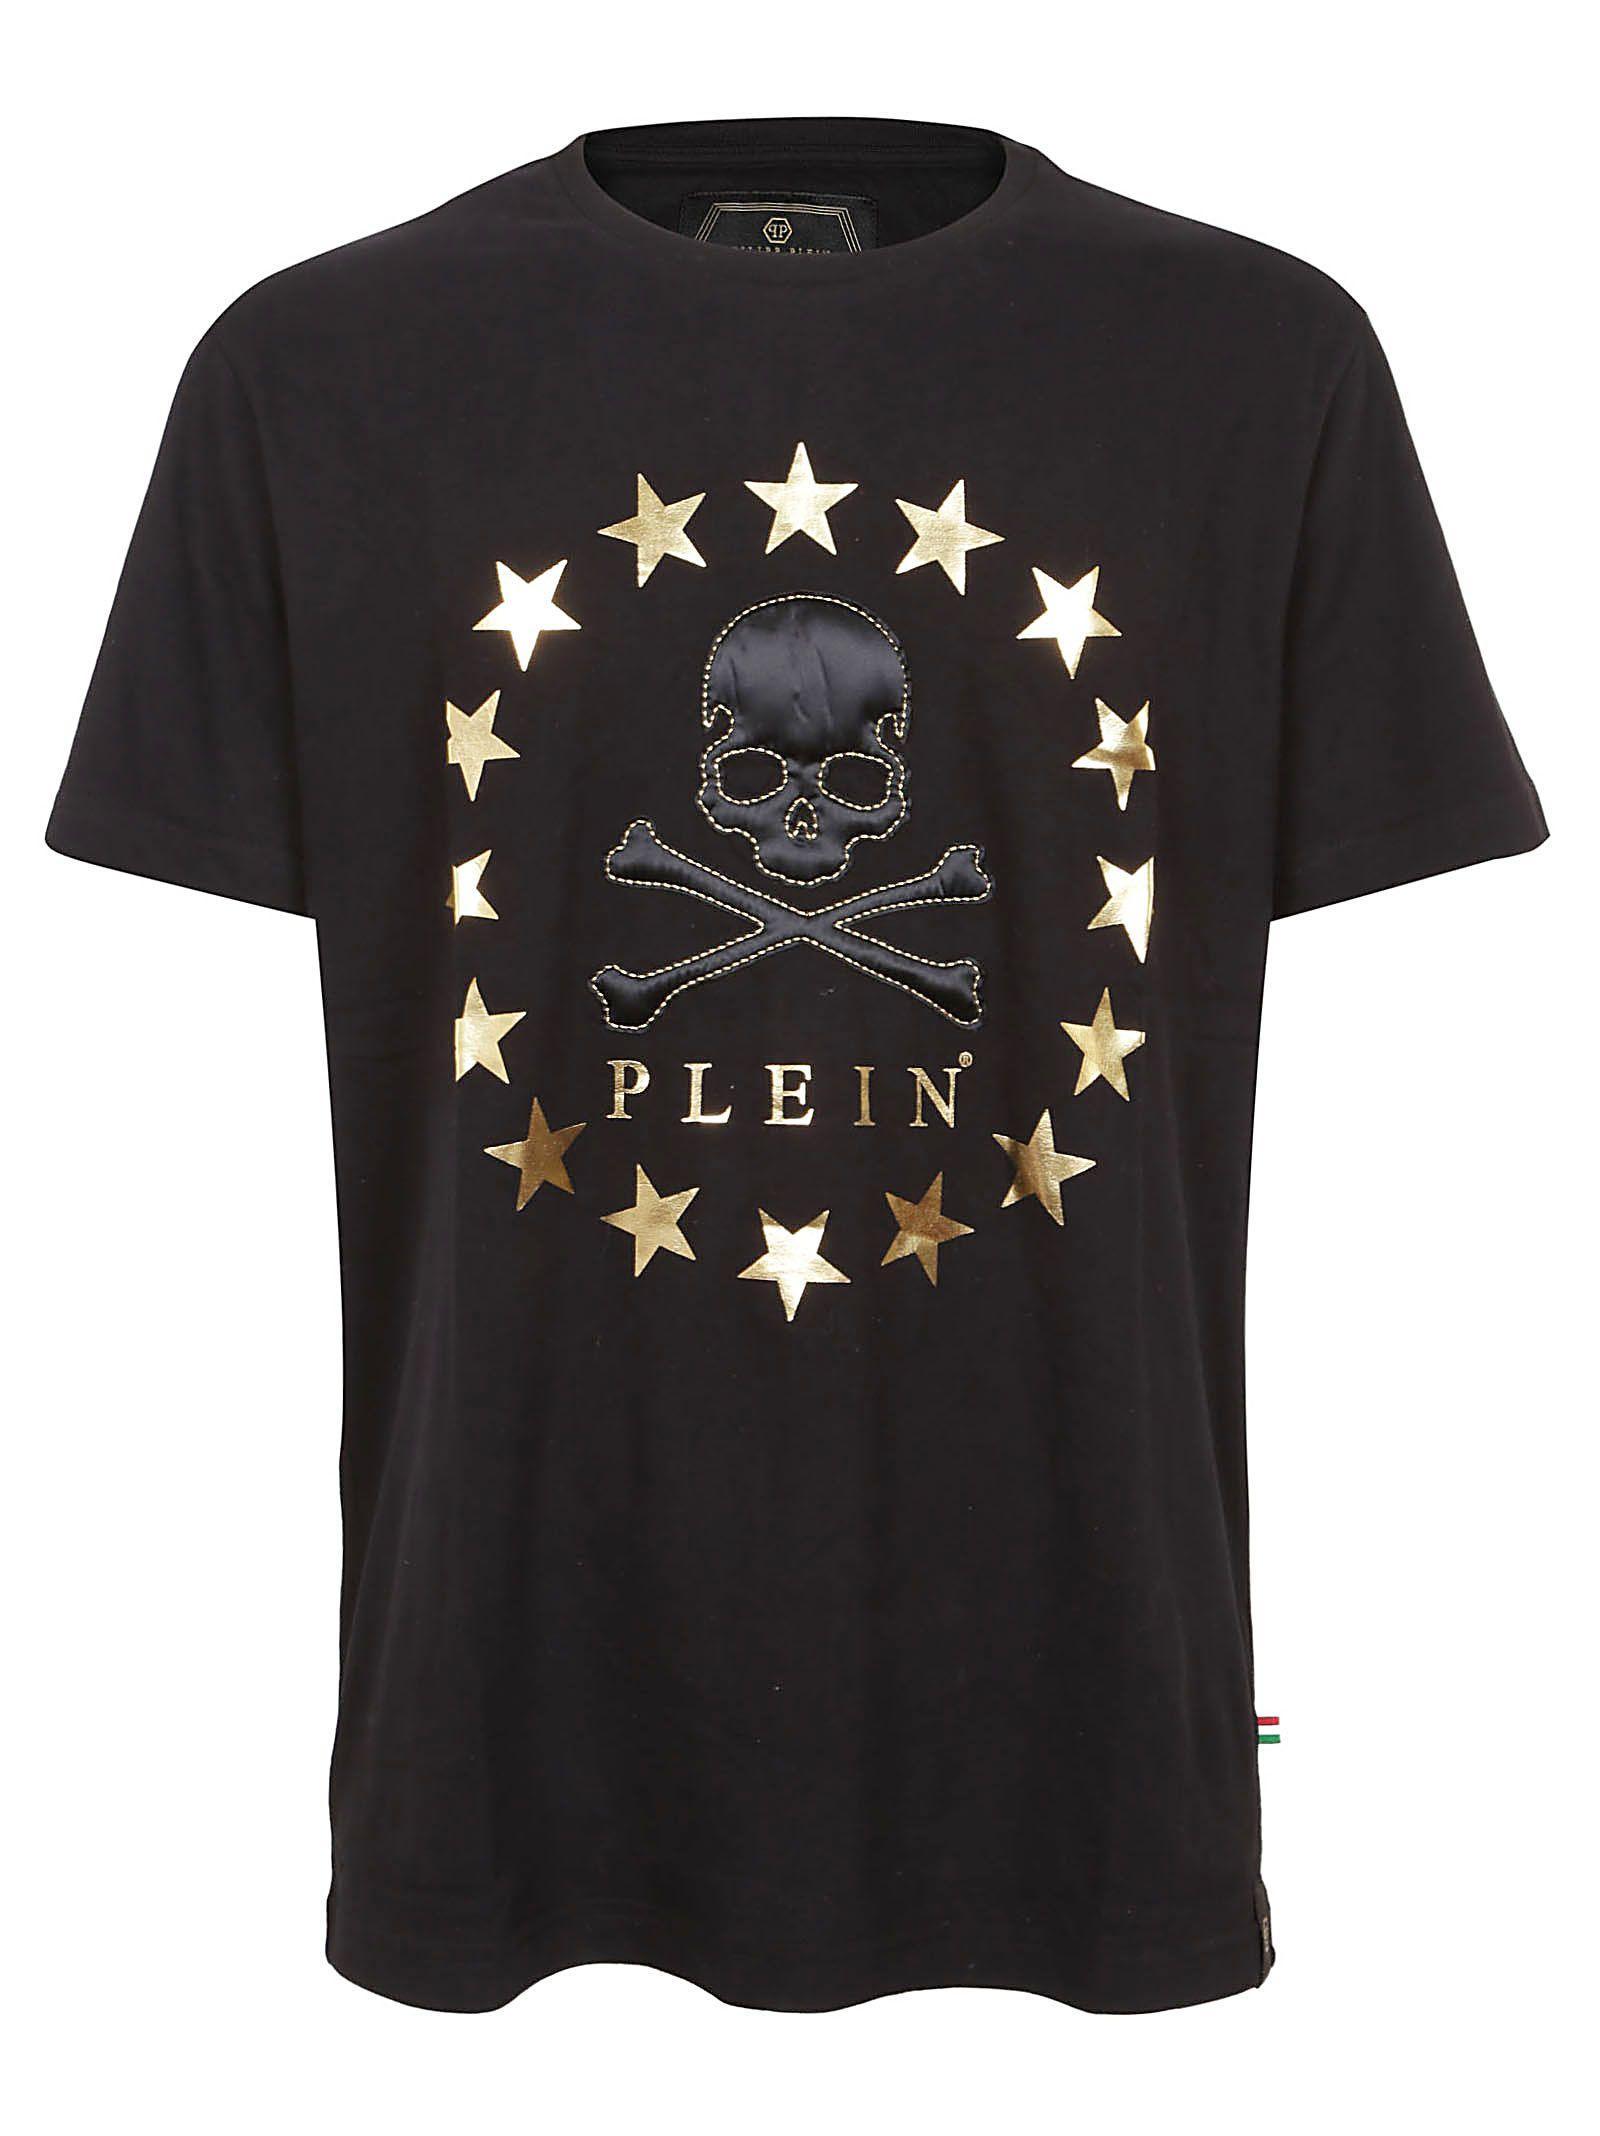 Philipp Plein Embellished Skull T-shirt In Black Gold